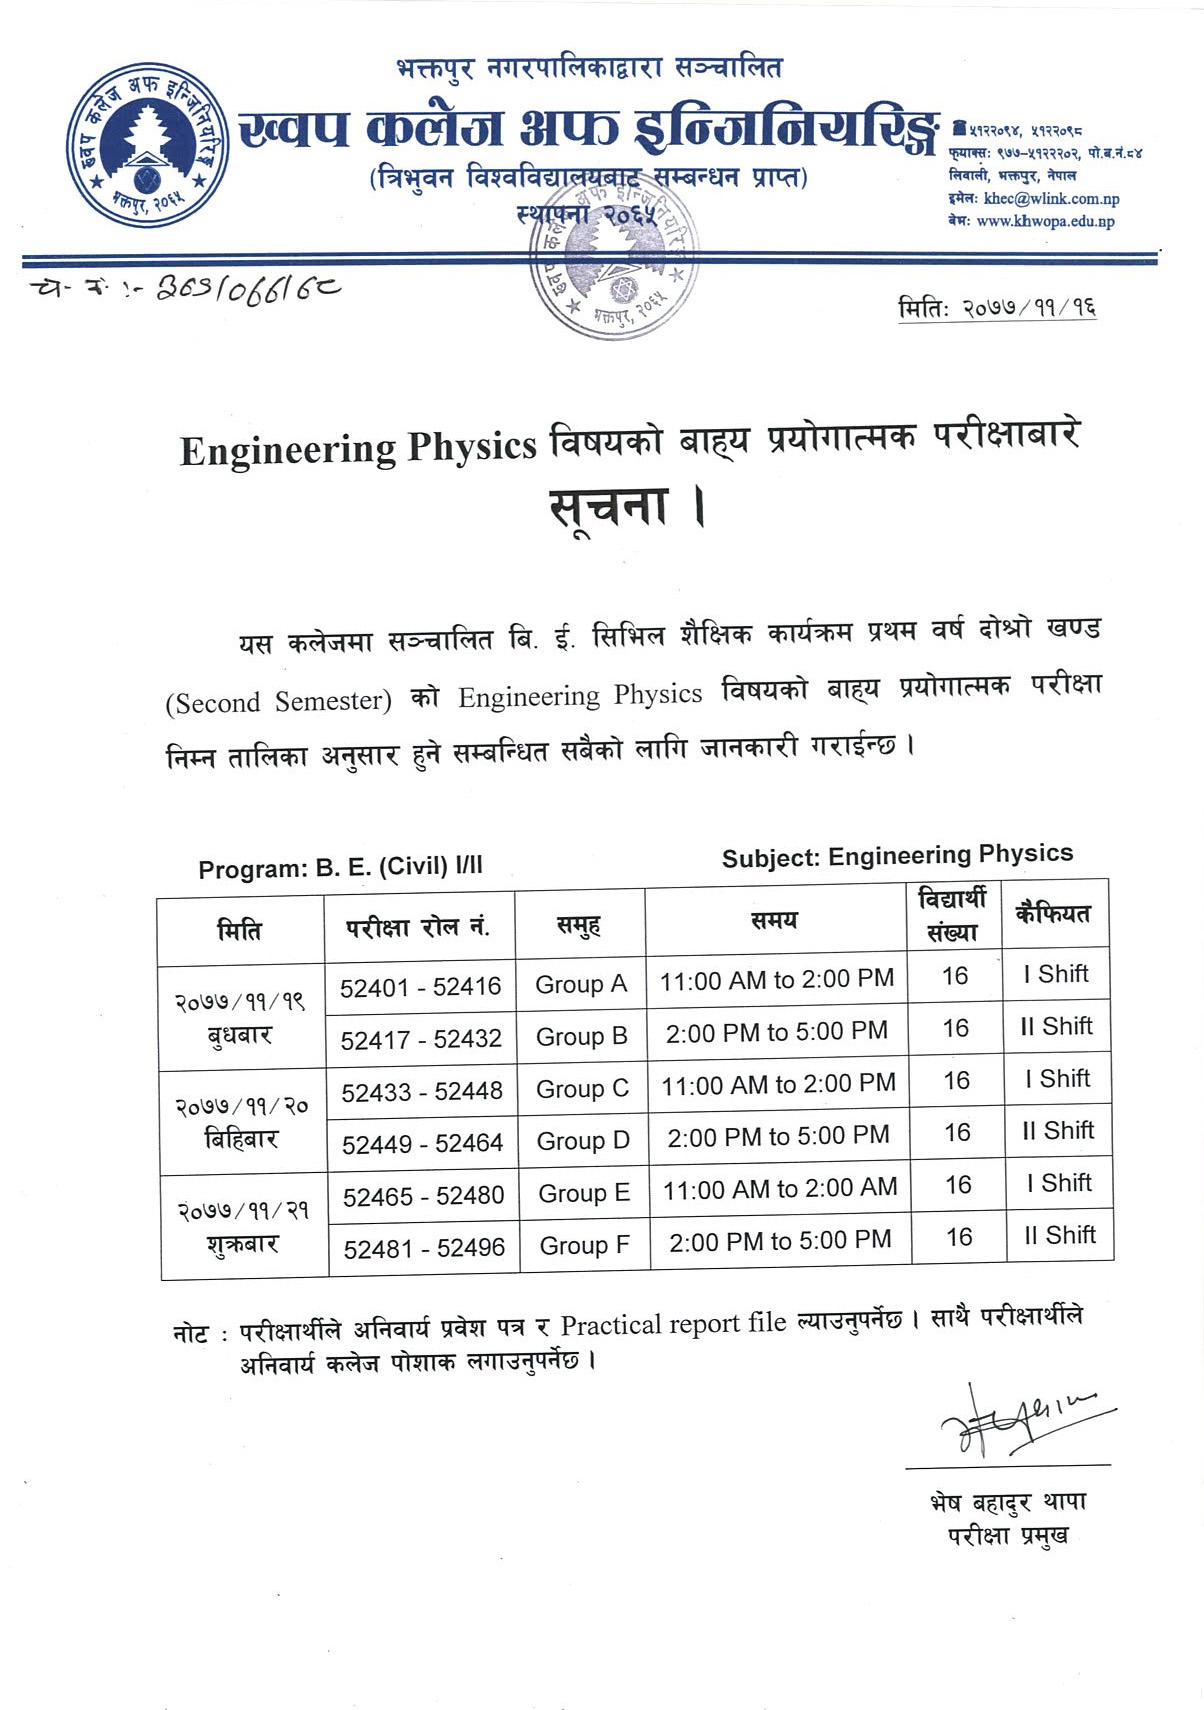 Engineering Physics विषयकाे बाह्य प्रयाेगात्मक परीक्षाबारे सूचना ।